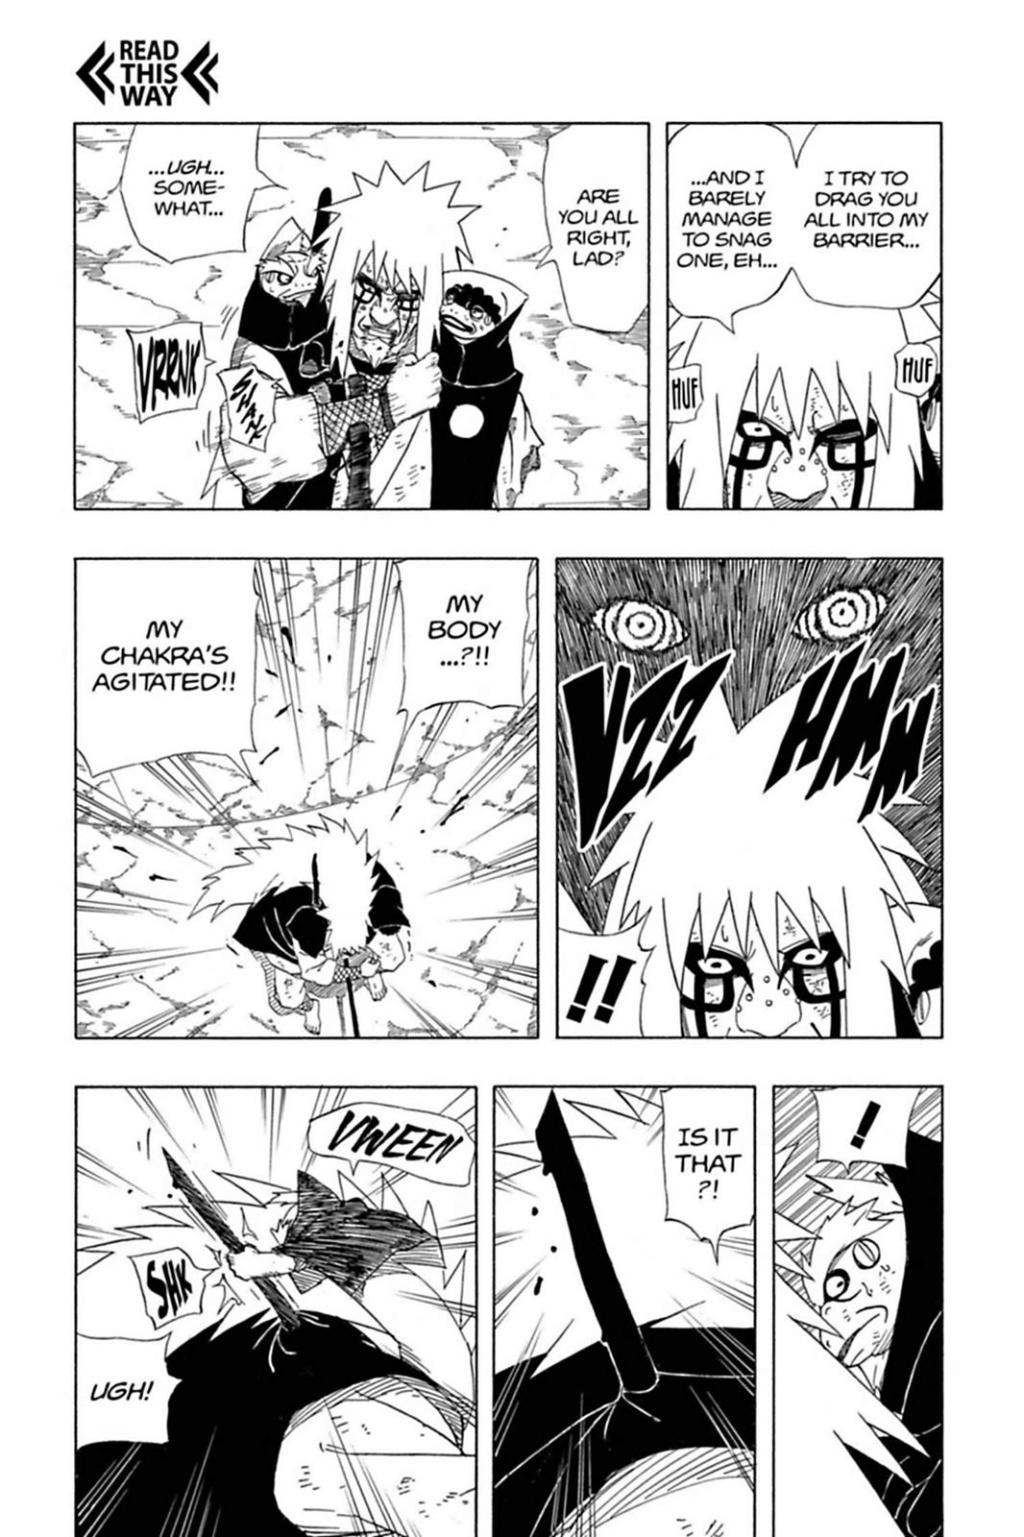 Jiraya vs Nagato - Página 5 0381-010